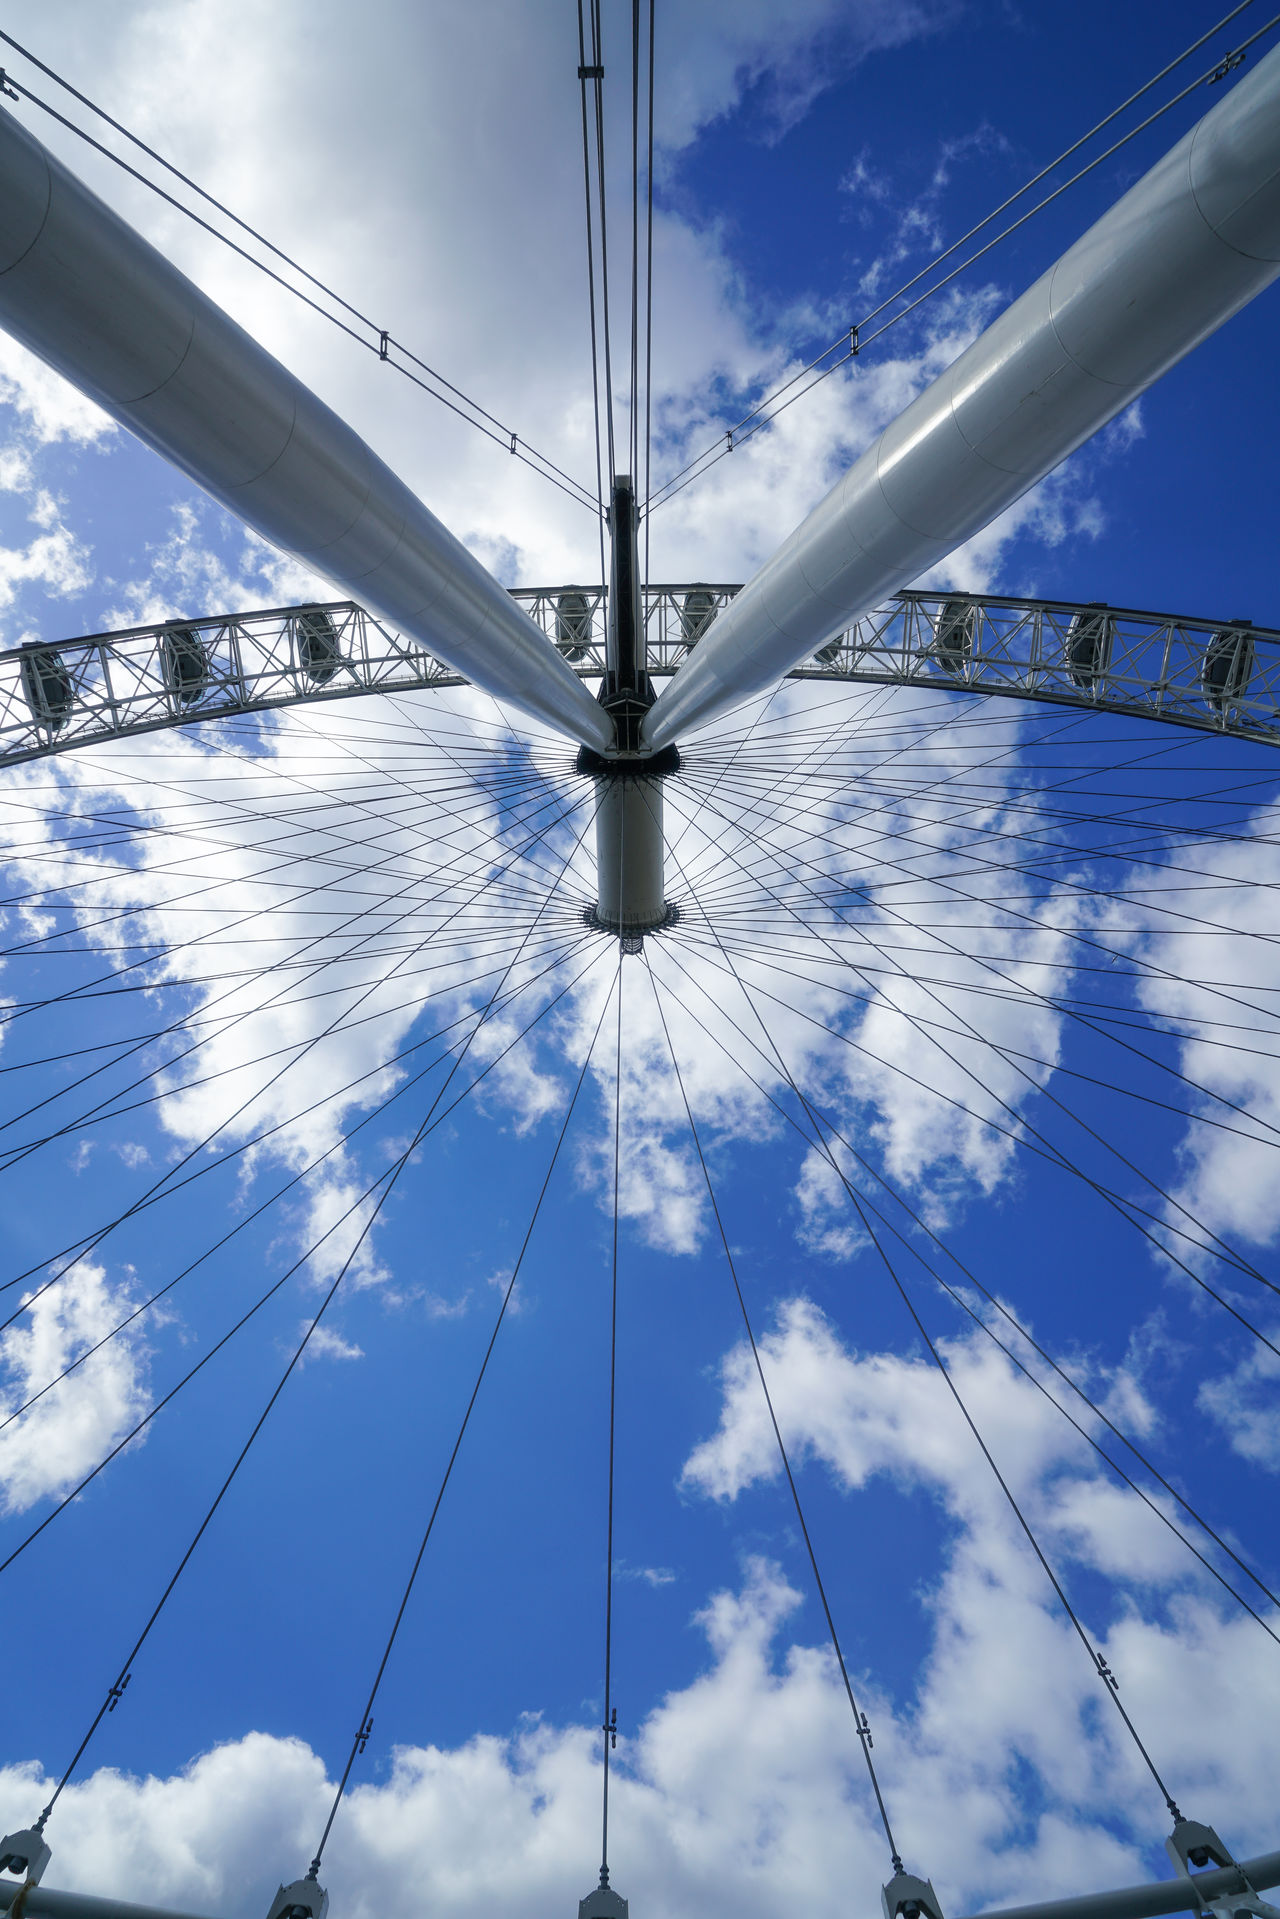 Blue Famous Landmarks Famous Places Ferris Wheel London London Eye Sky Sky And Clouds Structure Structures & Lines Tourism Tourist Attraction  Travel Destinations